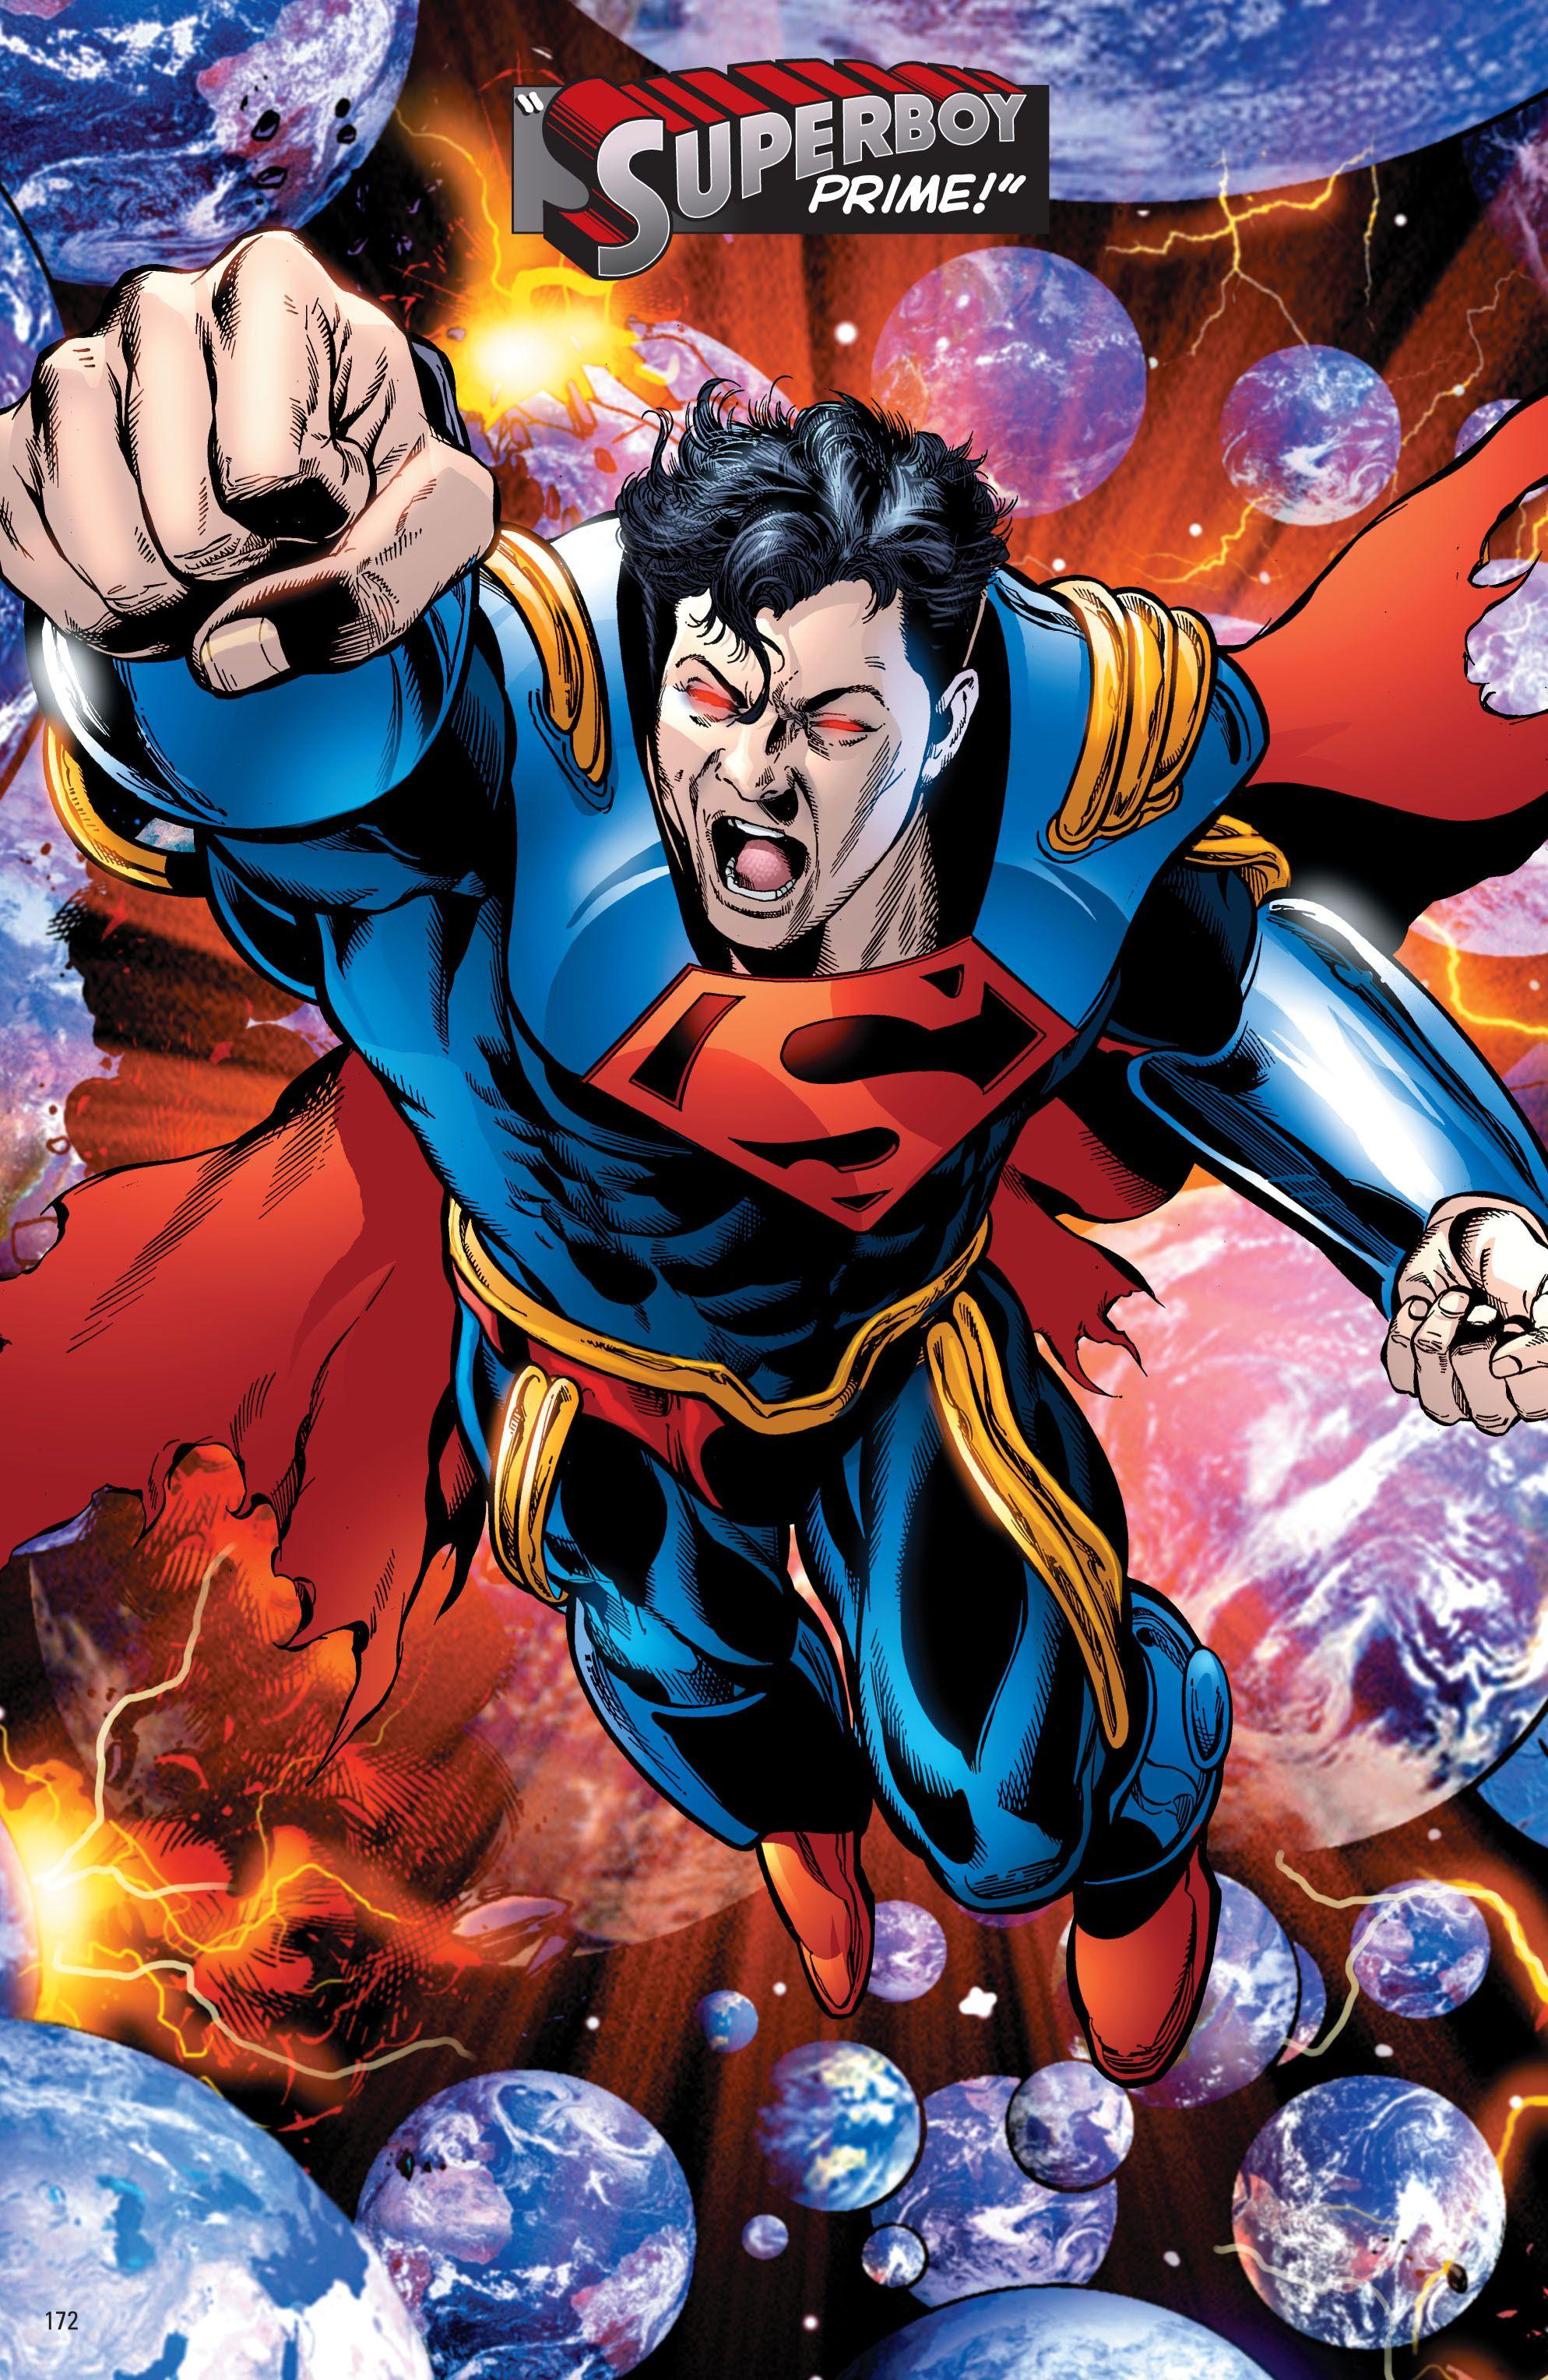 How To Get Superboy In Lego Dc Super Villains